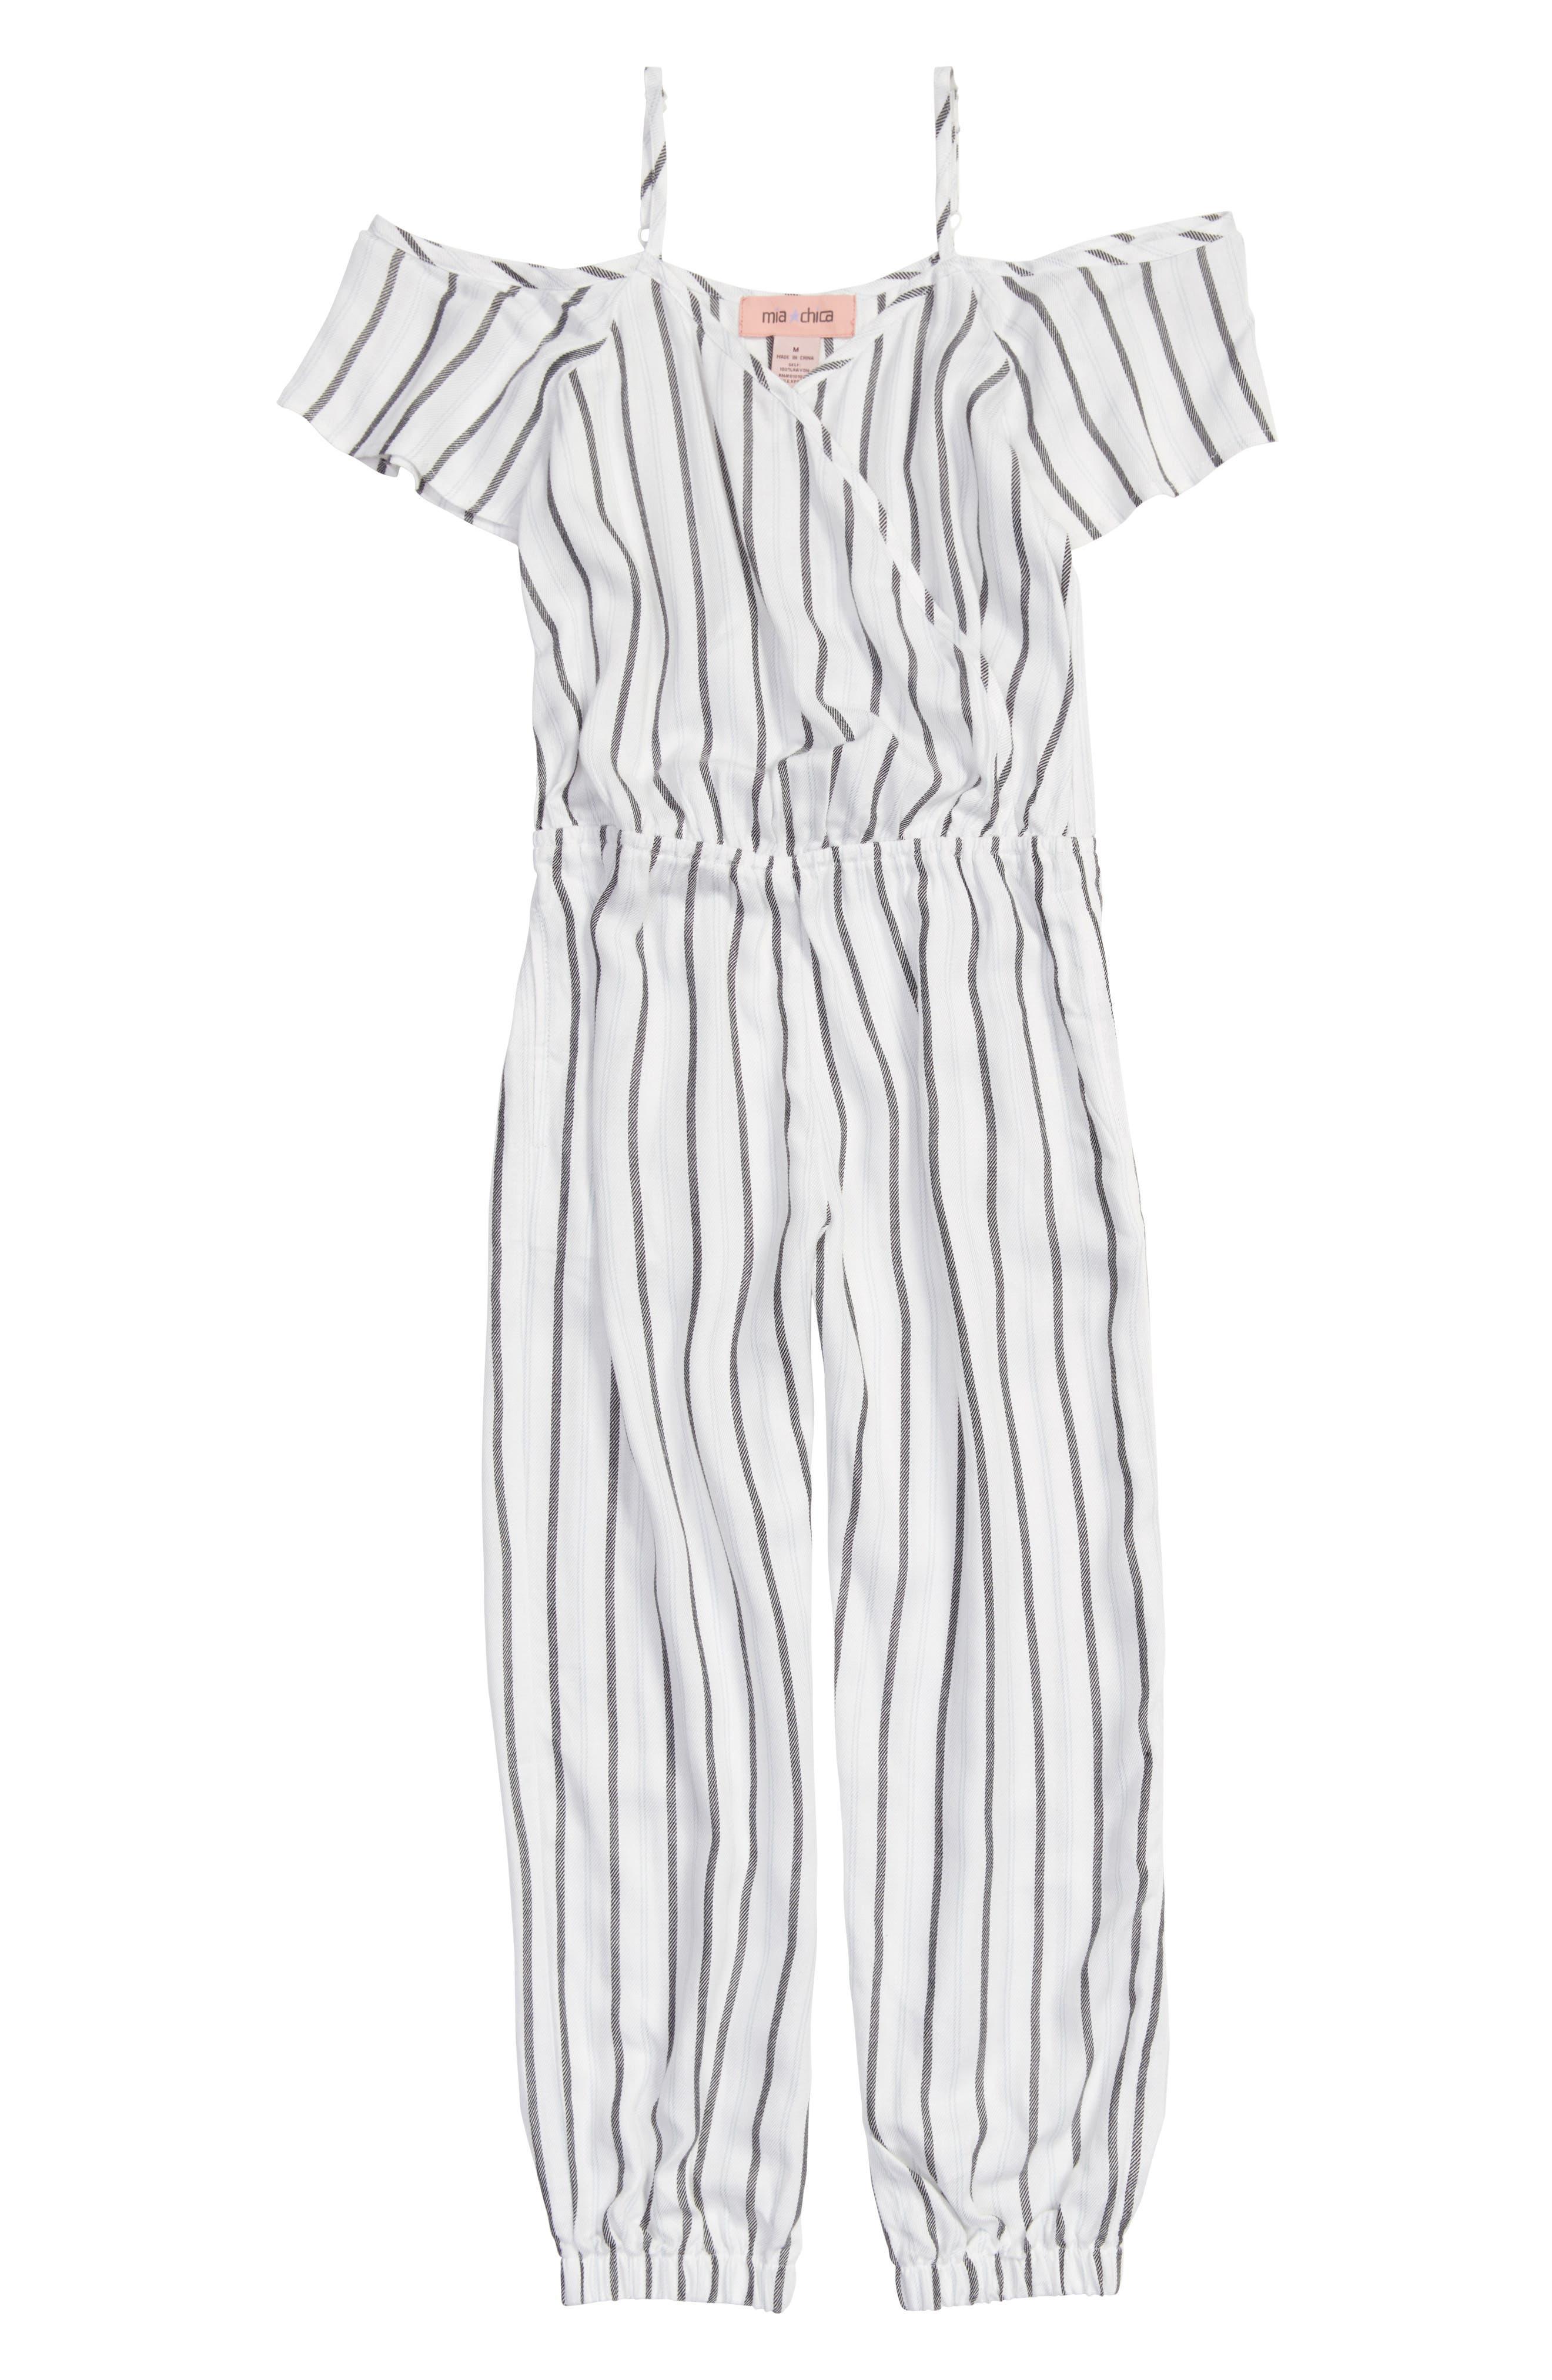 Main Image - Mia Chica Cold Shoulder Jumpsuit (Big Girls)